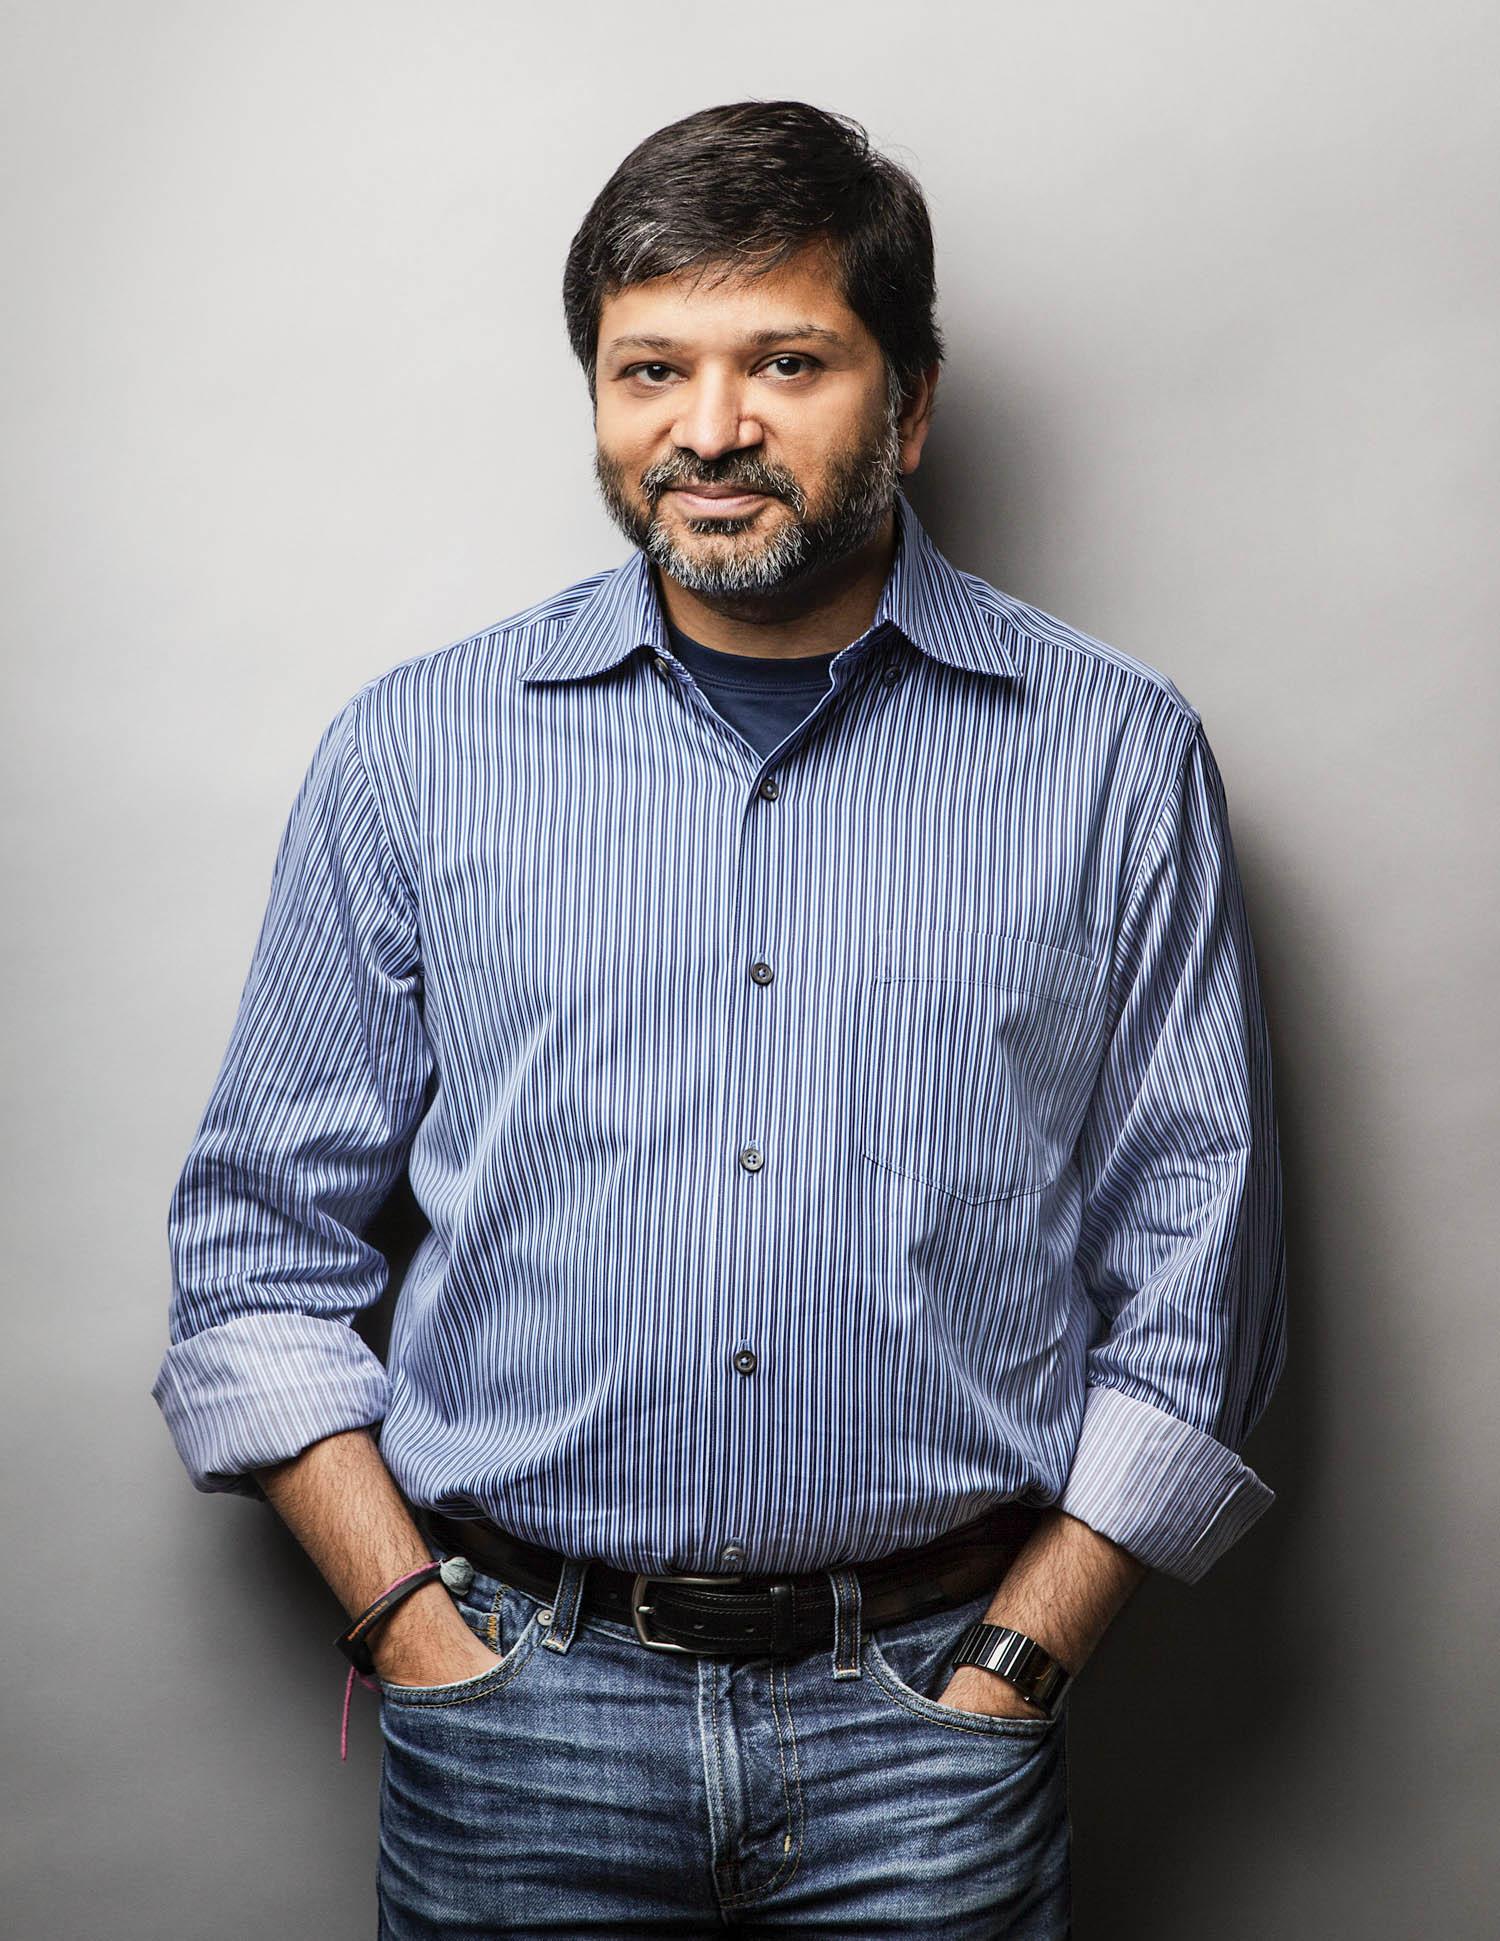 Dharmesh Shah photographed by Adam DeTour